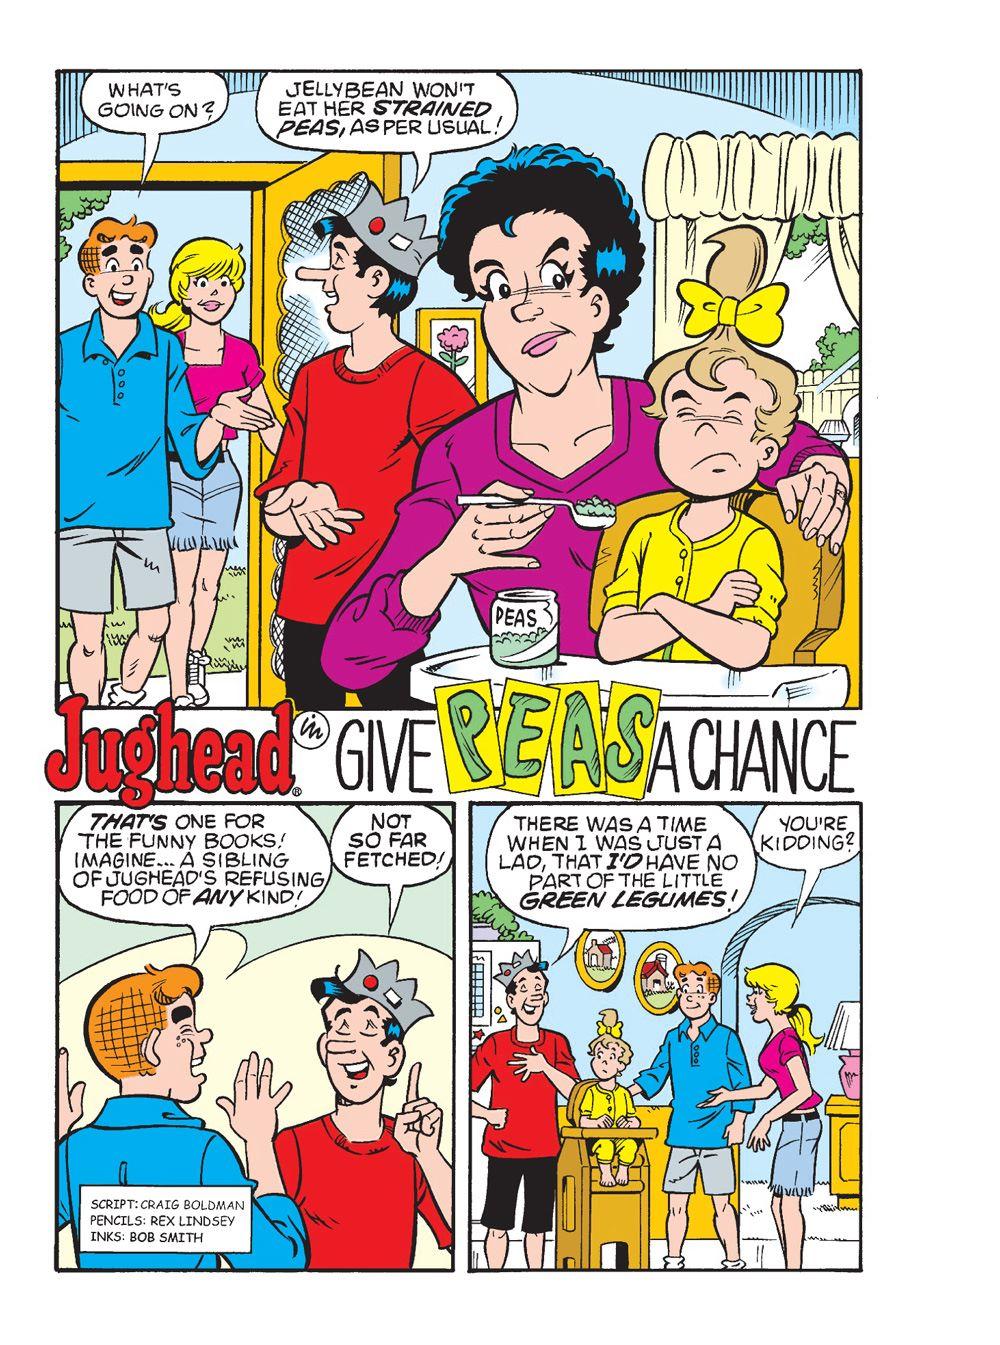 ArchieShowcaseDigest_04-170 ComicList Previews: ARCHIE SHOWCASE DIGEST #4